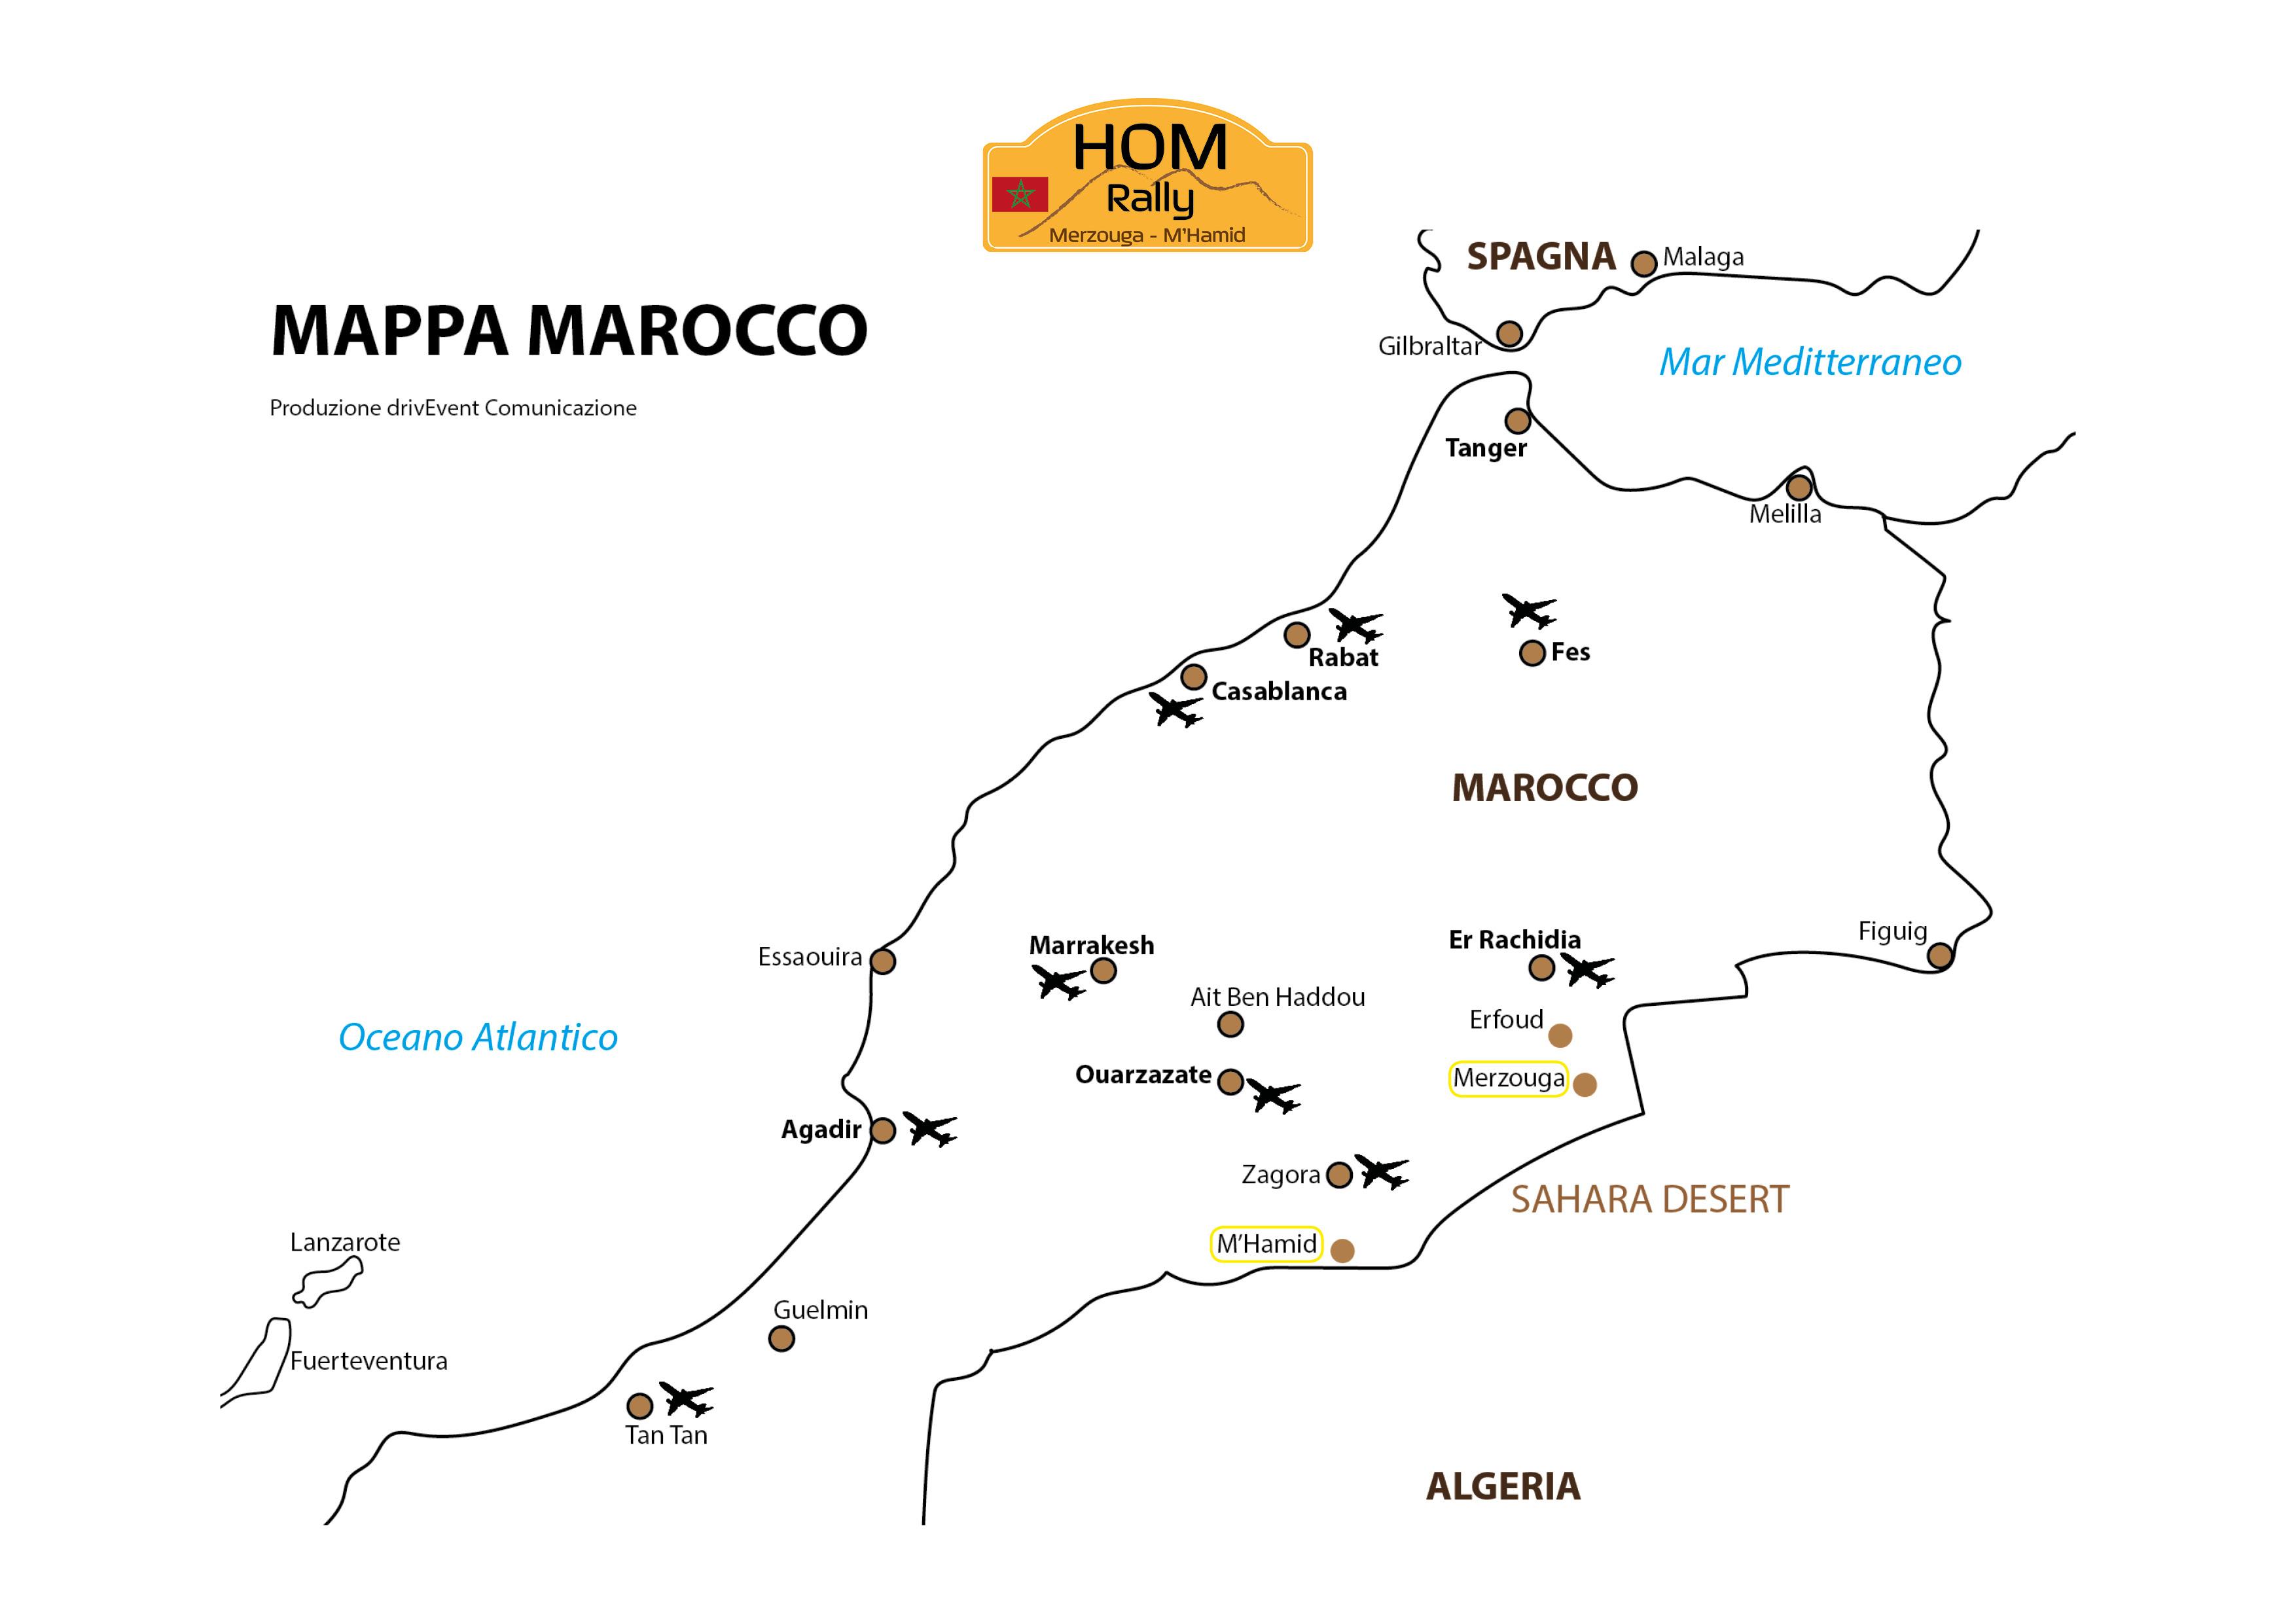 Mappa HoM Rally 2019